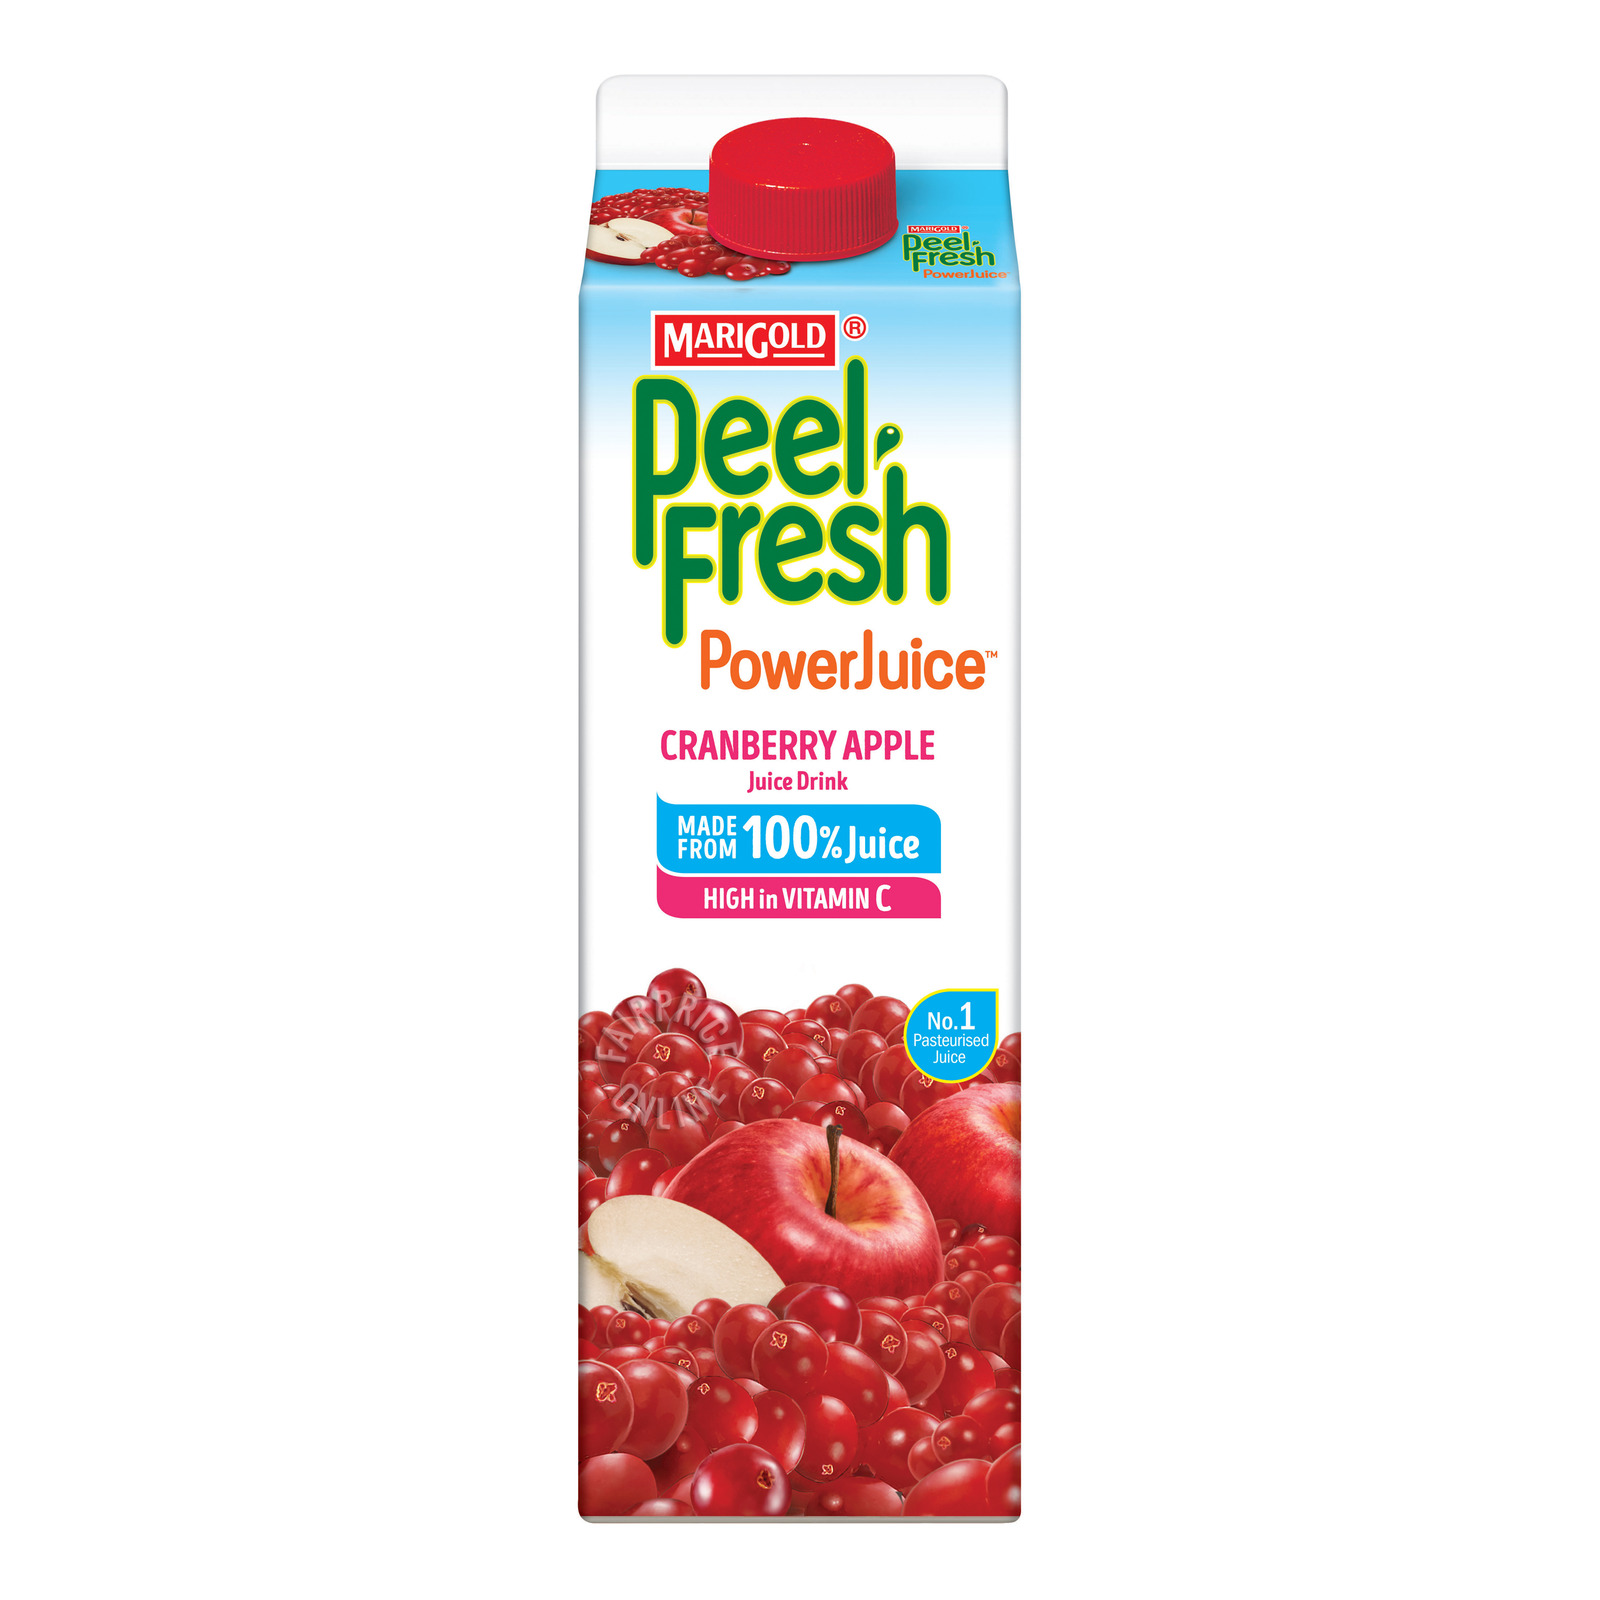 Marigold Peel Fresh Juice - Cranberry Apple (No Sugar)